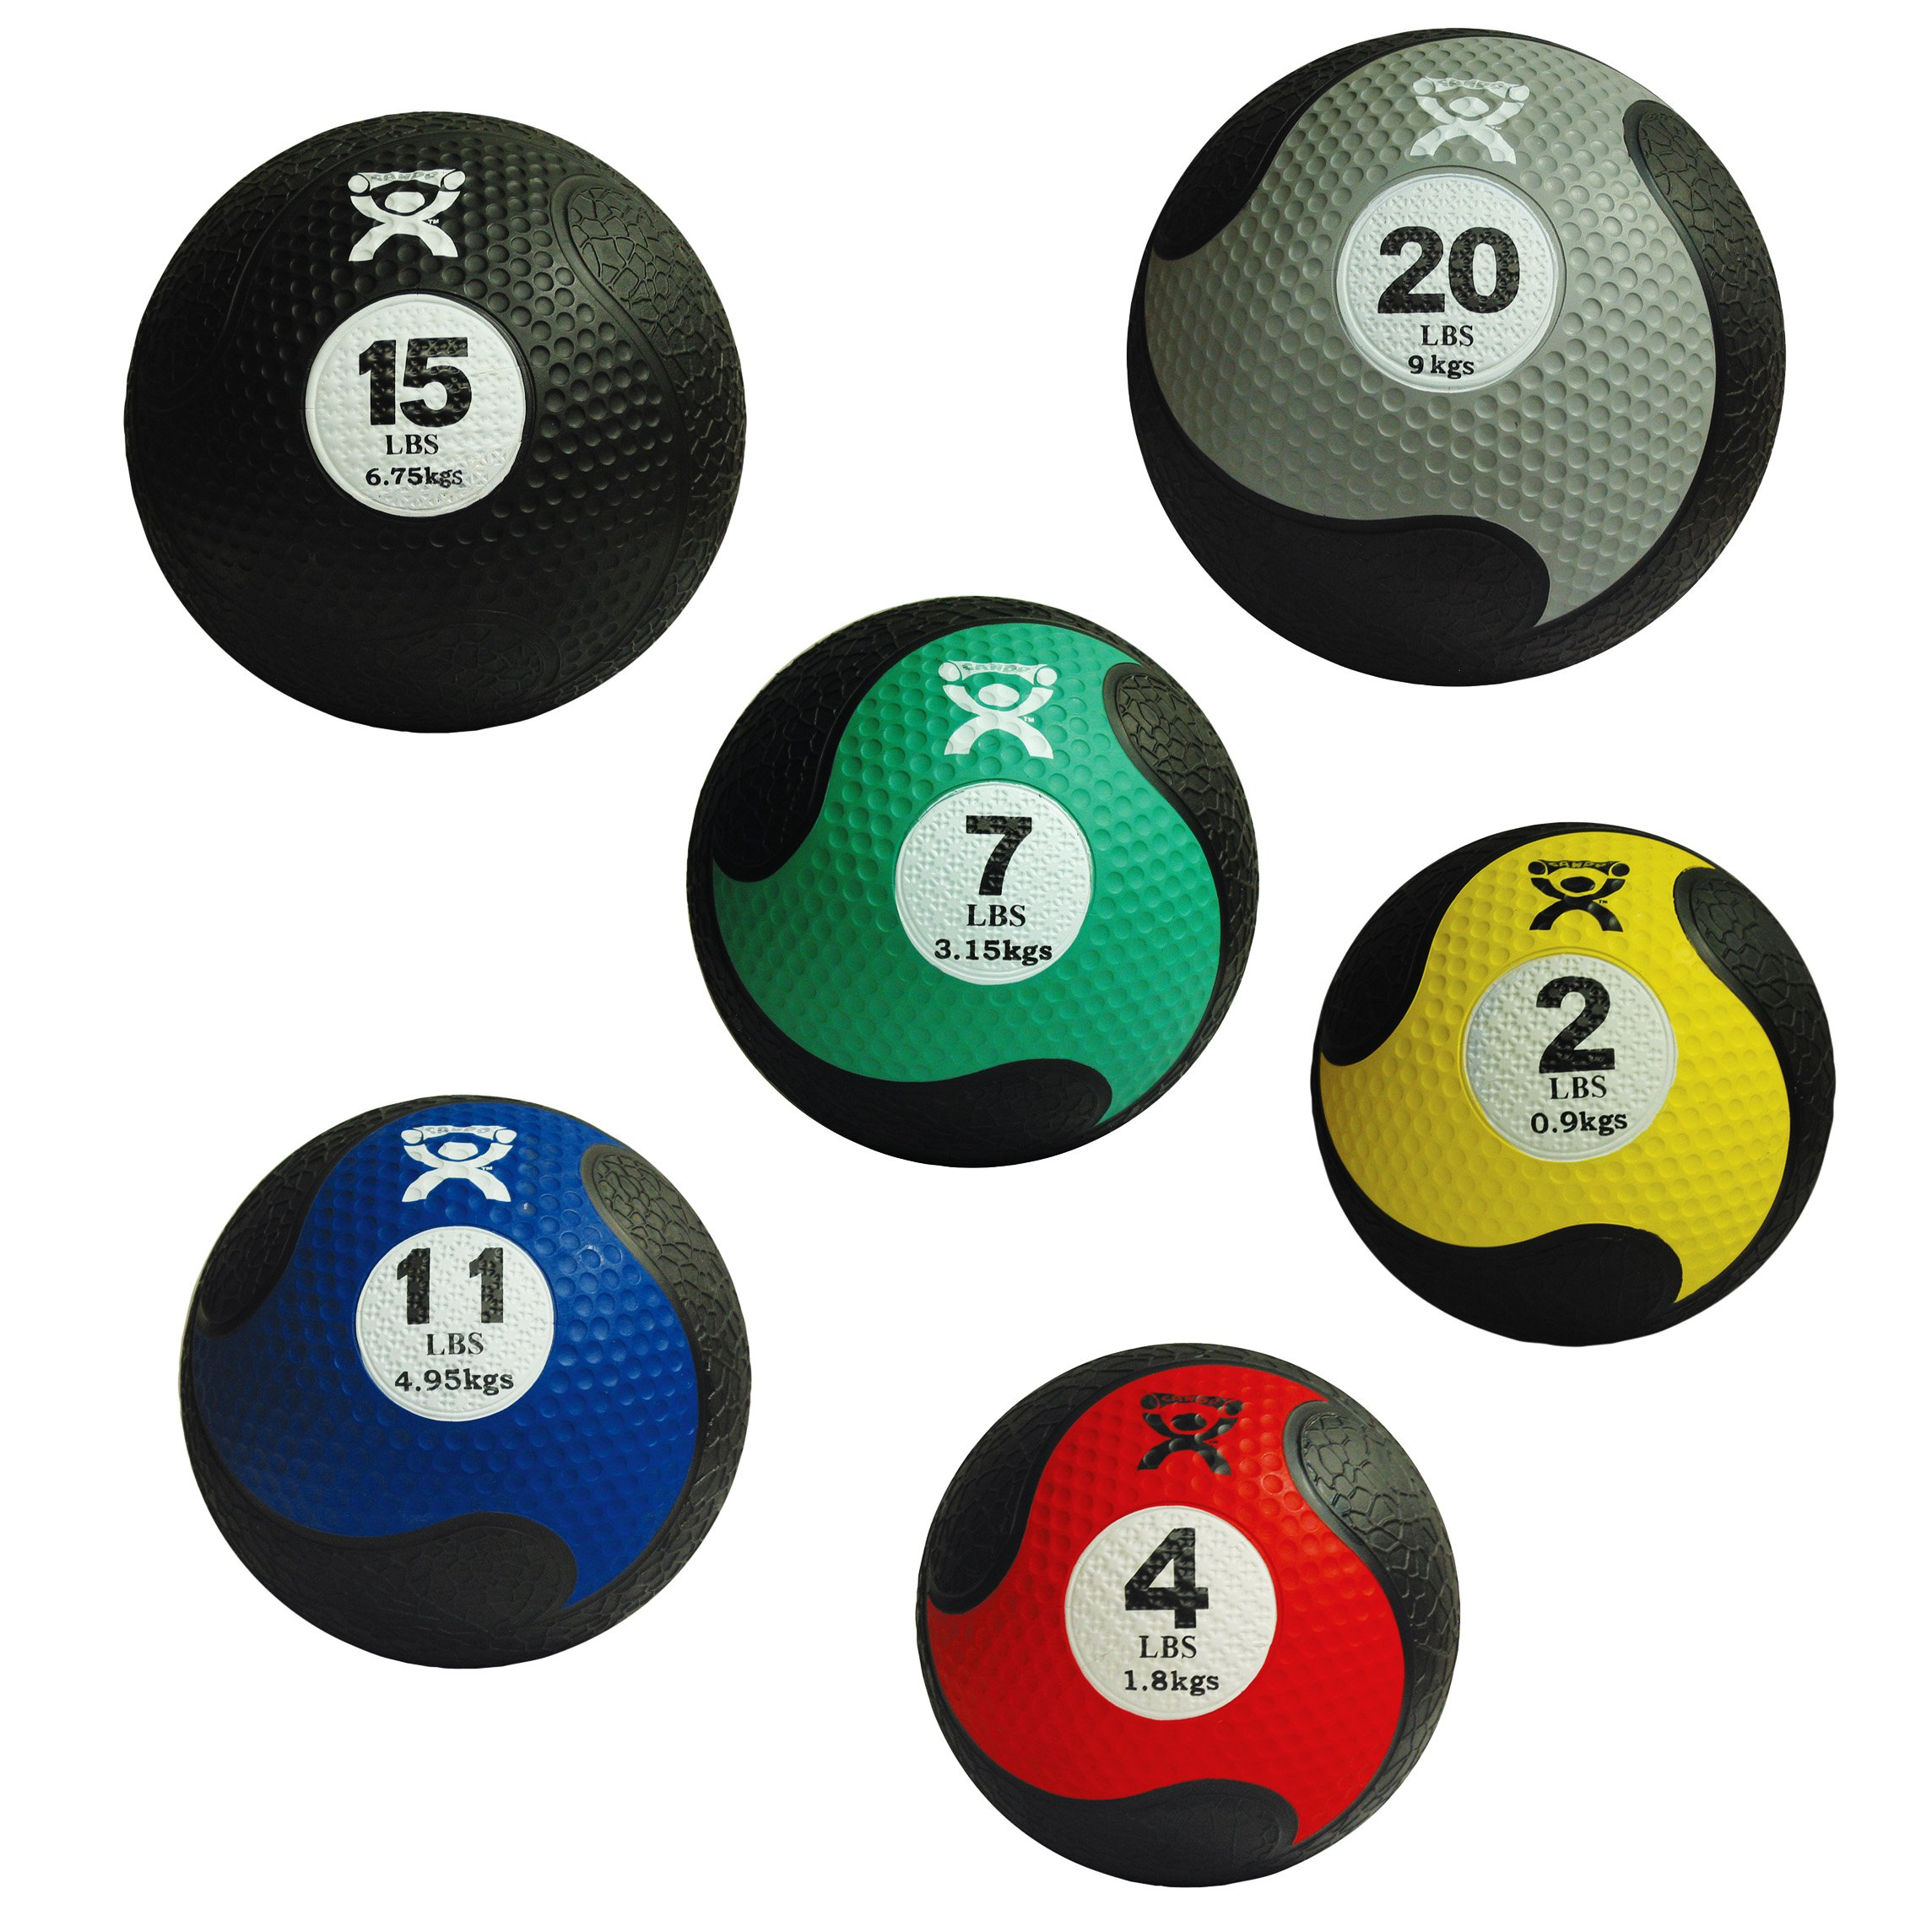 Cando Firm Fitness Medicine Balls - 6-Piece Bundle - 1 Each: 2, 4, 7, 11, 15, 20 LB by Cando (Image #1)